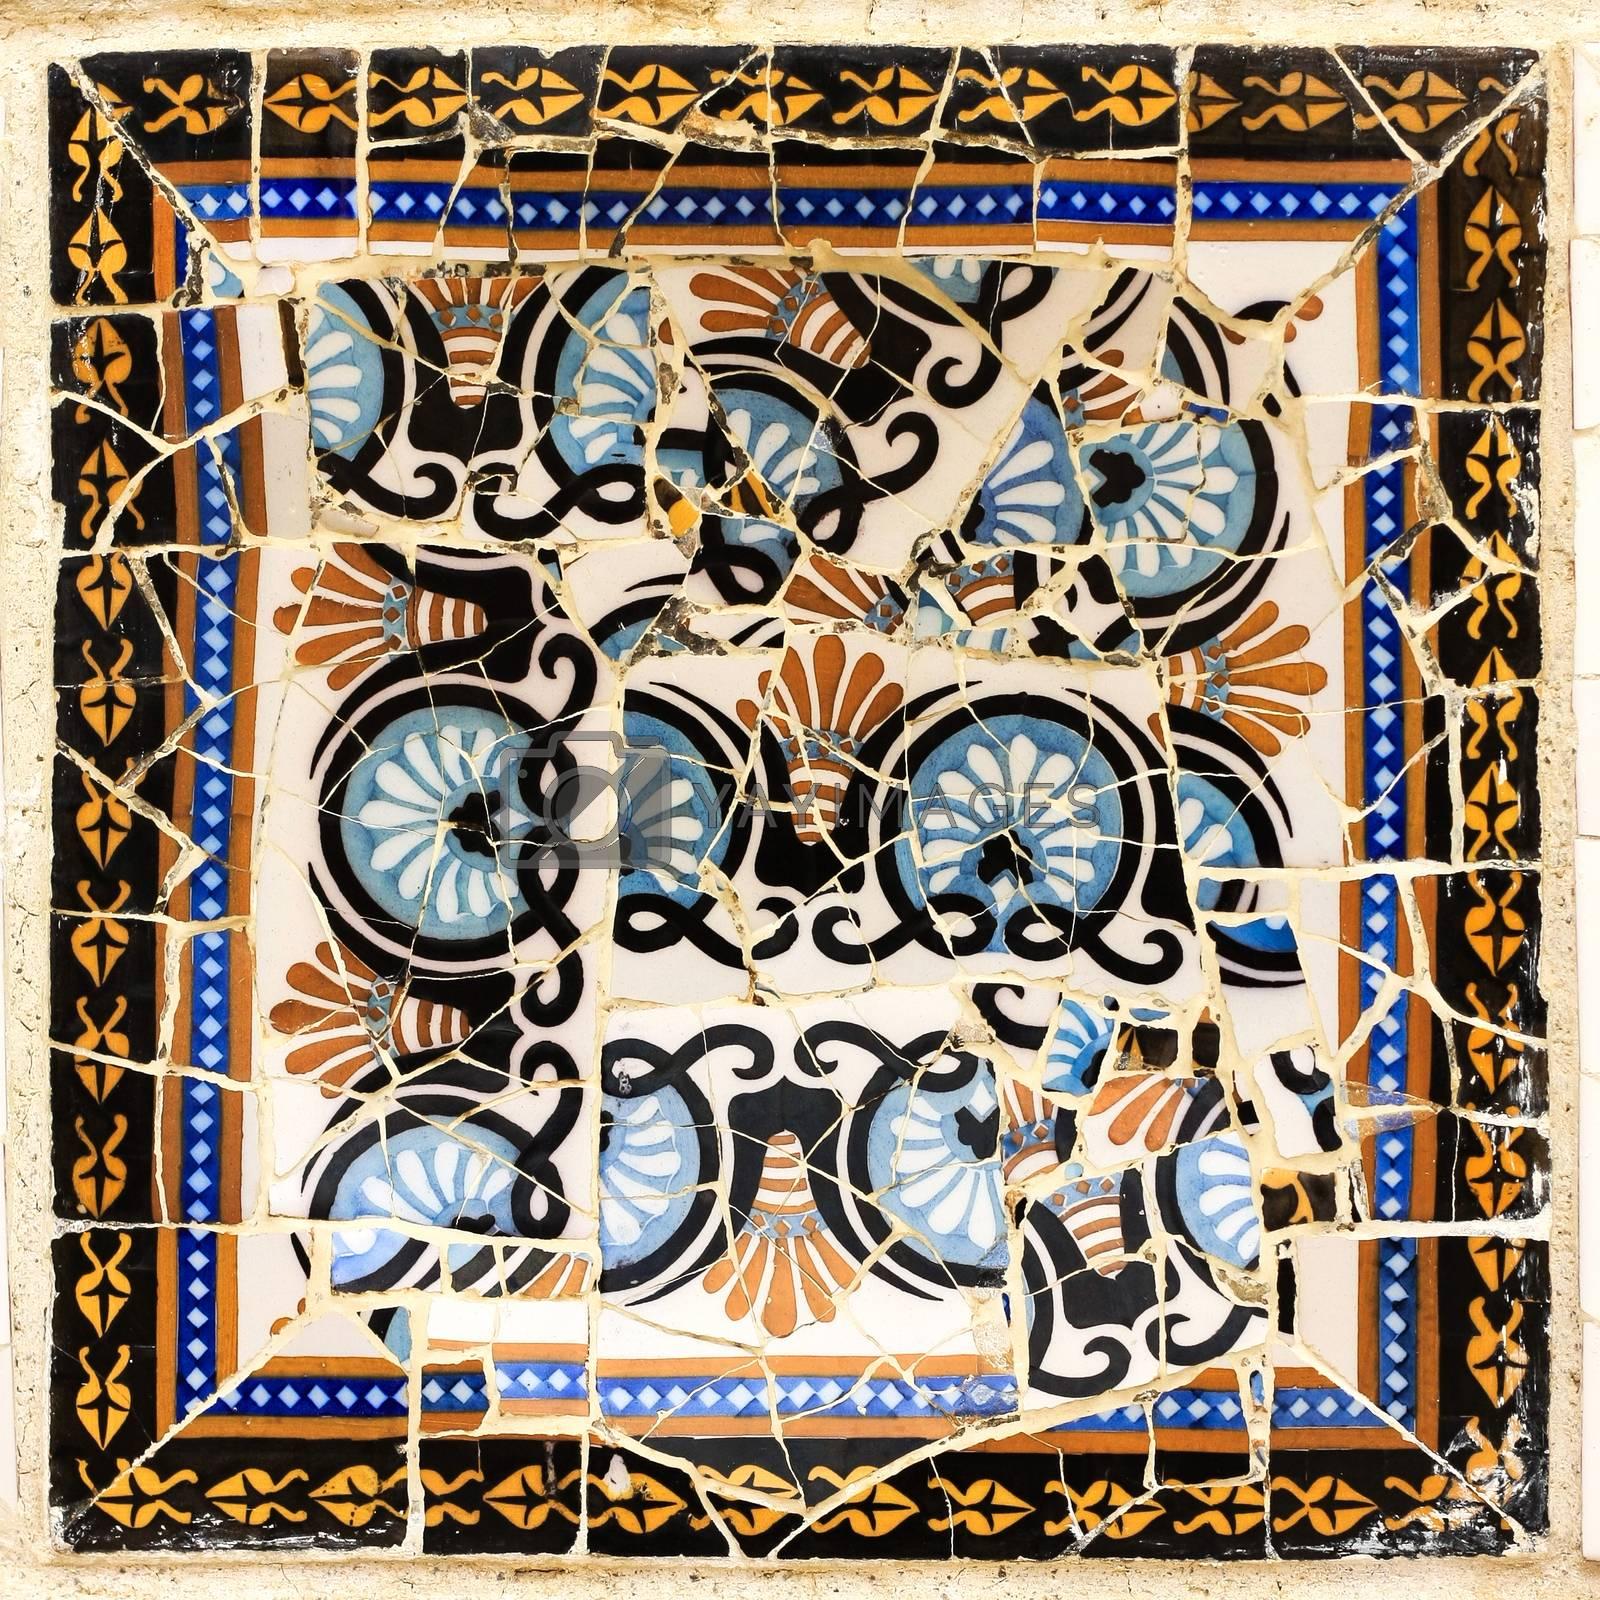 Patterns mota by Digoarpi